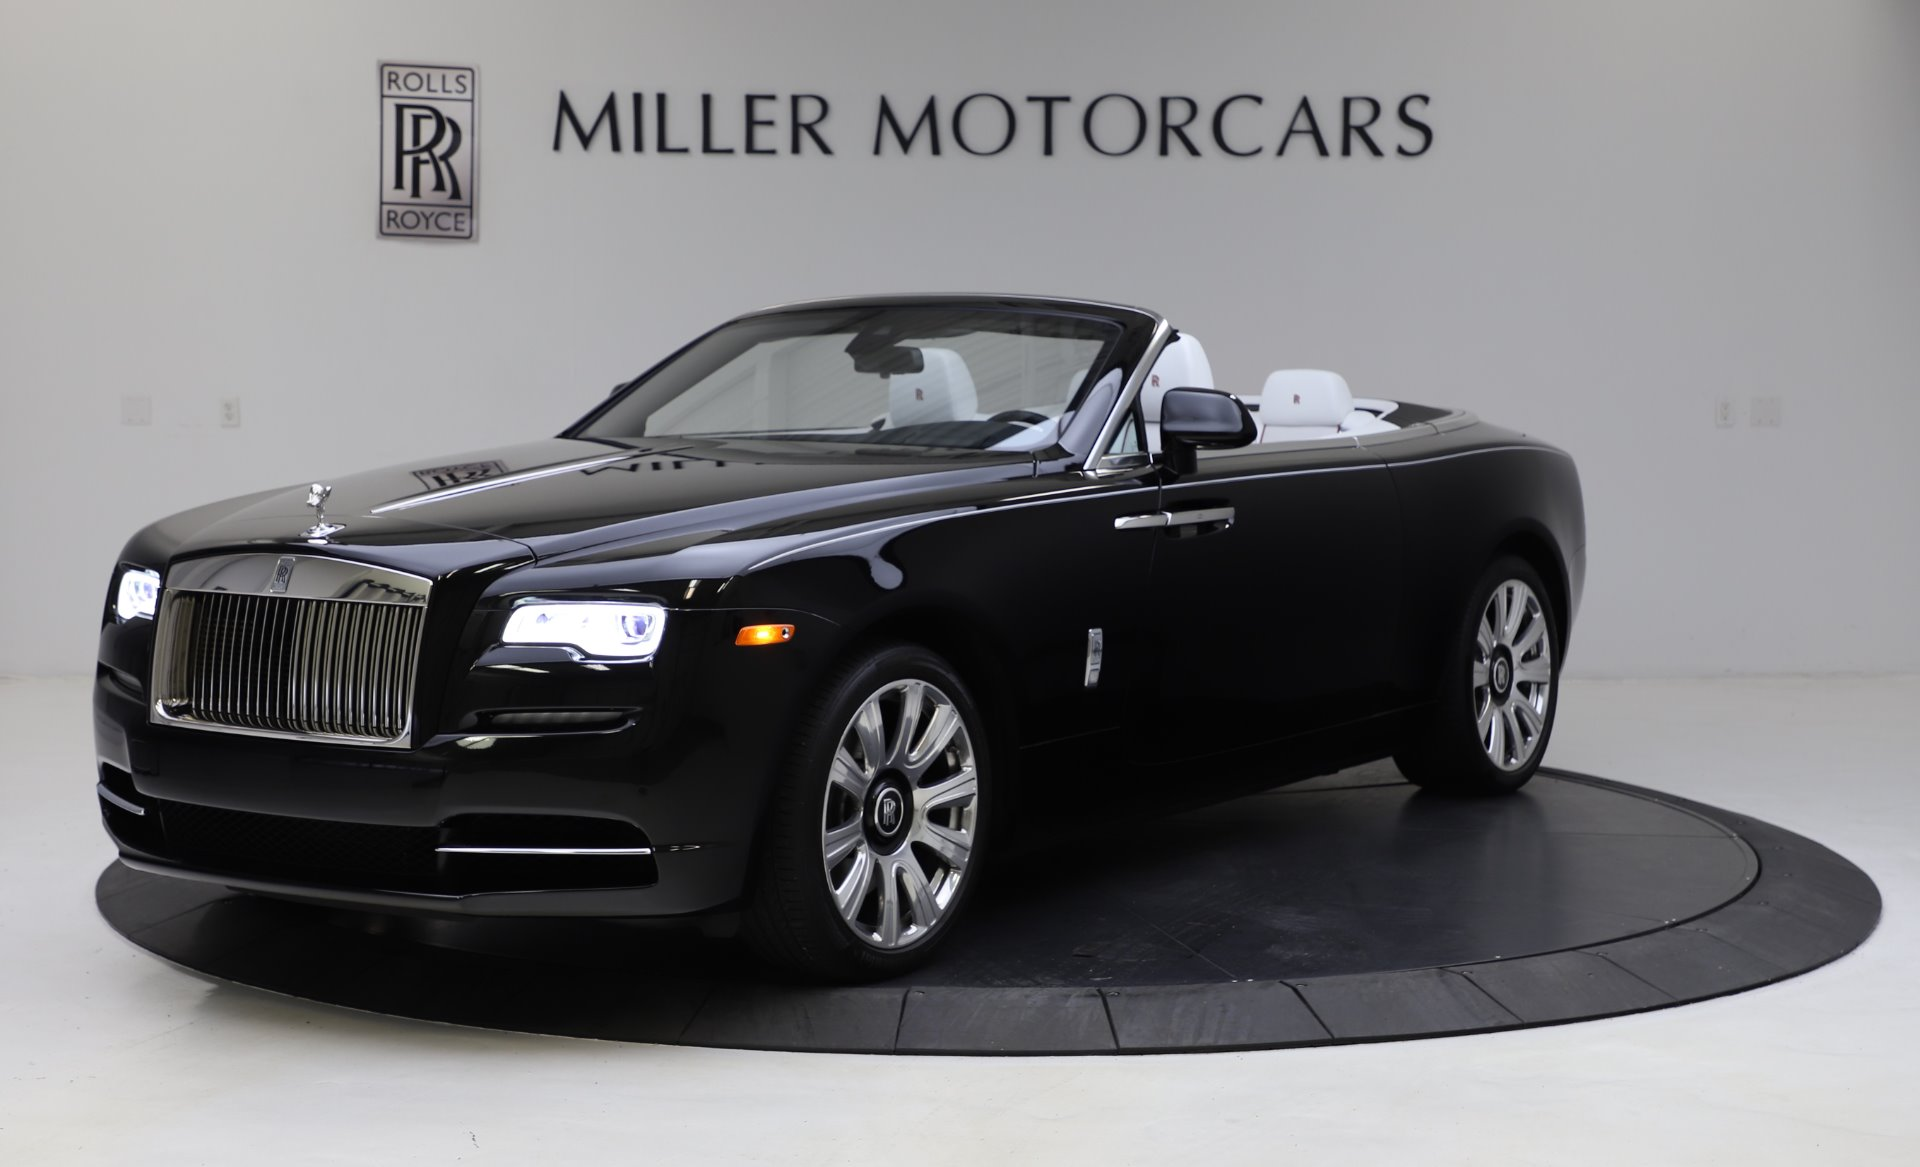 Used 2016 Rolls-Royce Dawn for sale Sold at Bugatti of Greenwich in Greenwich CT 06830 1